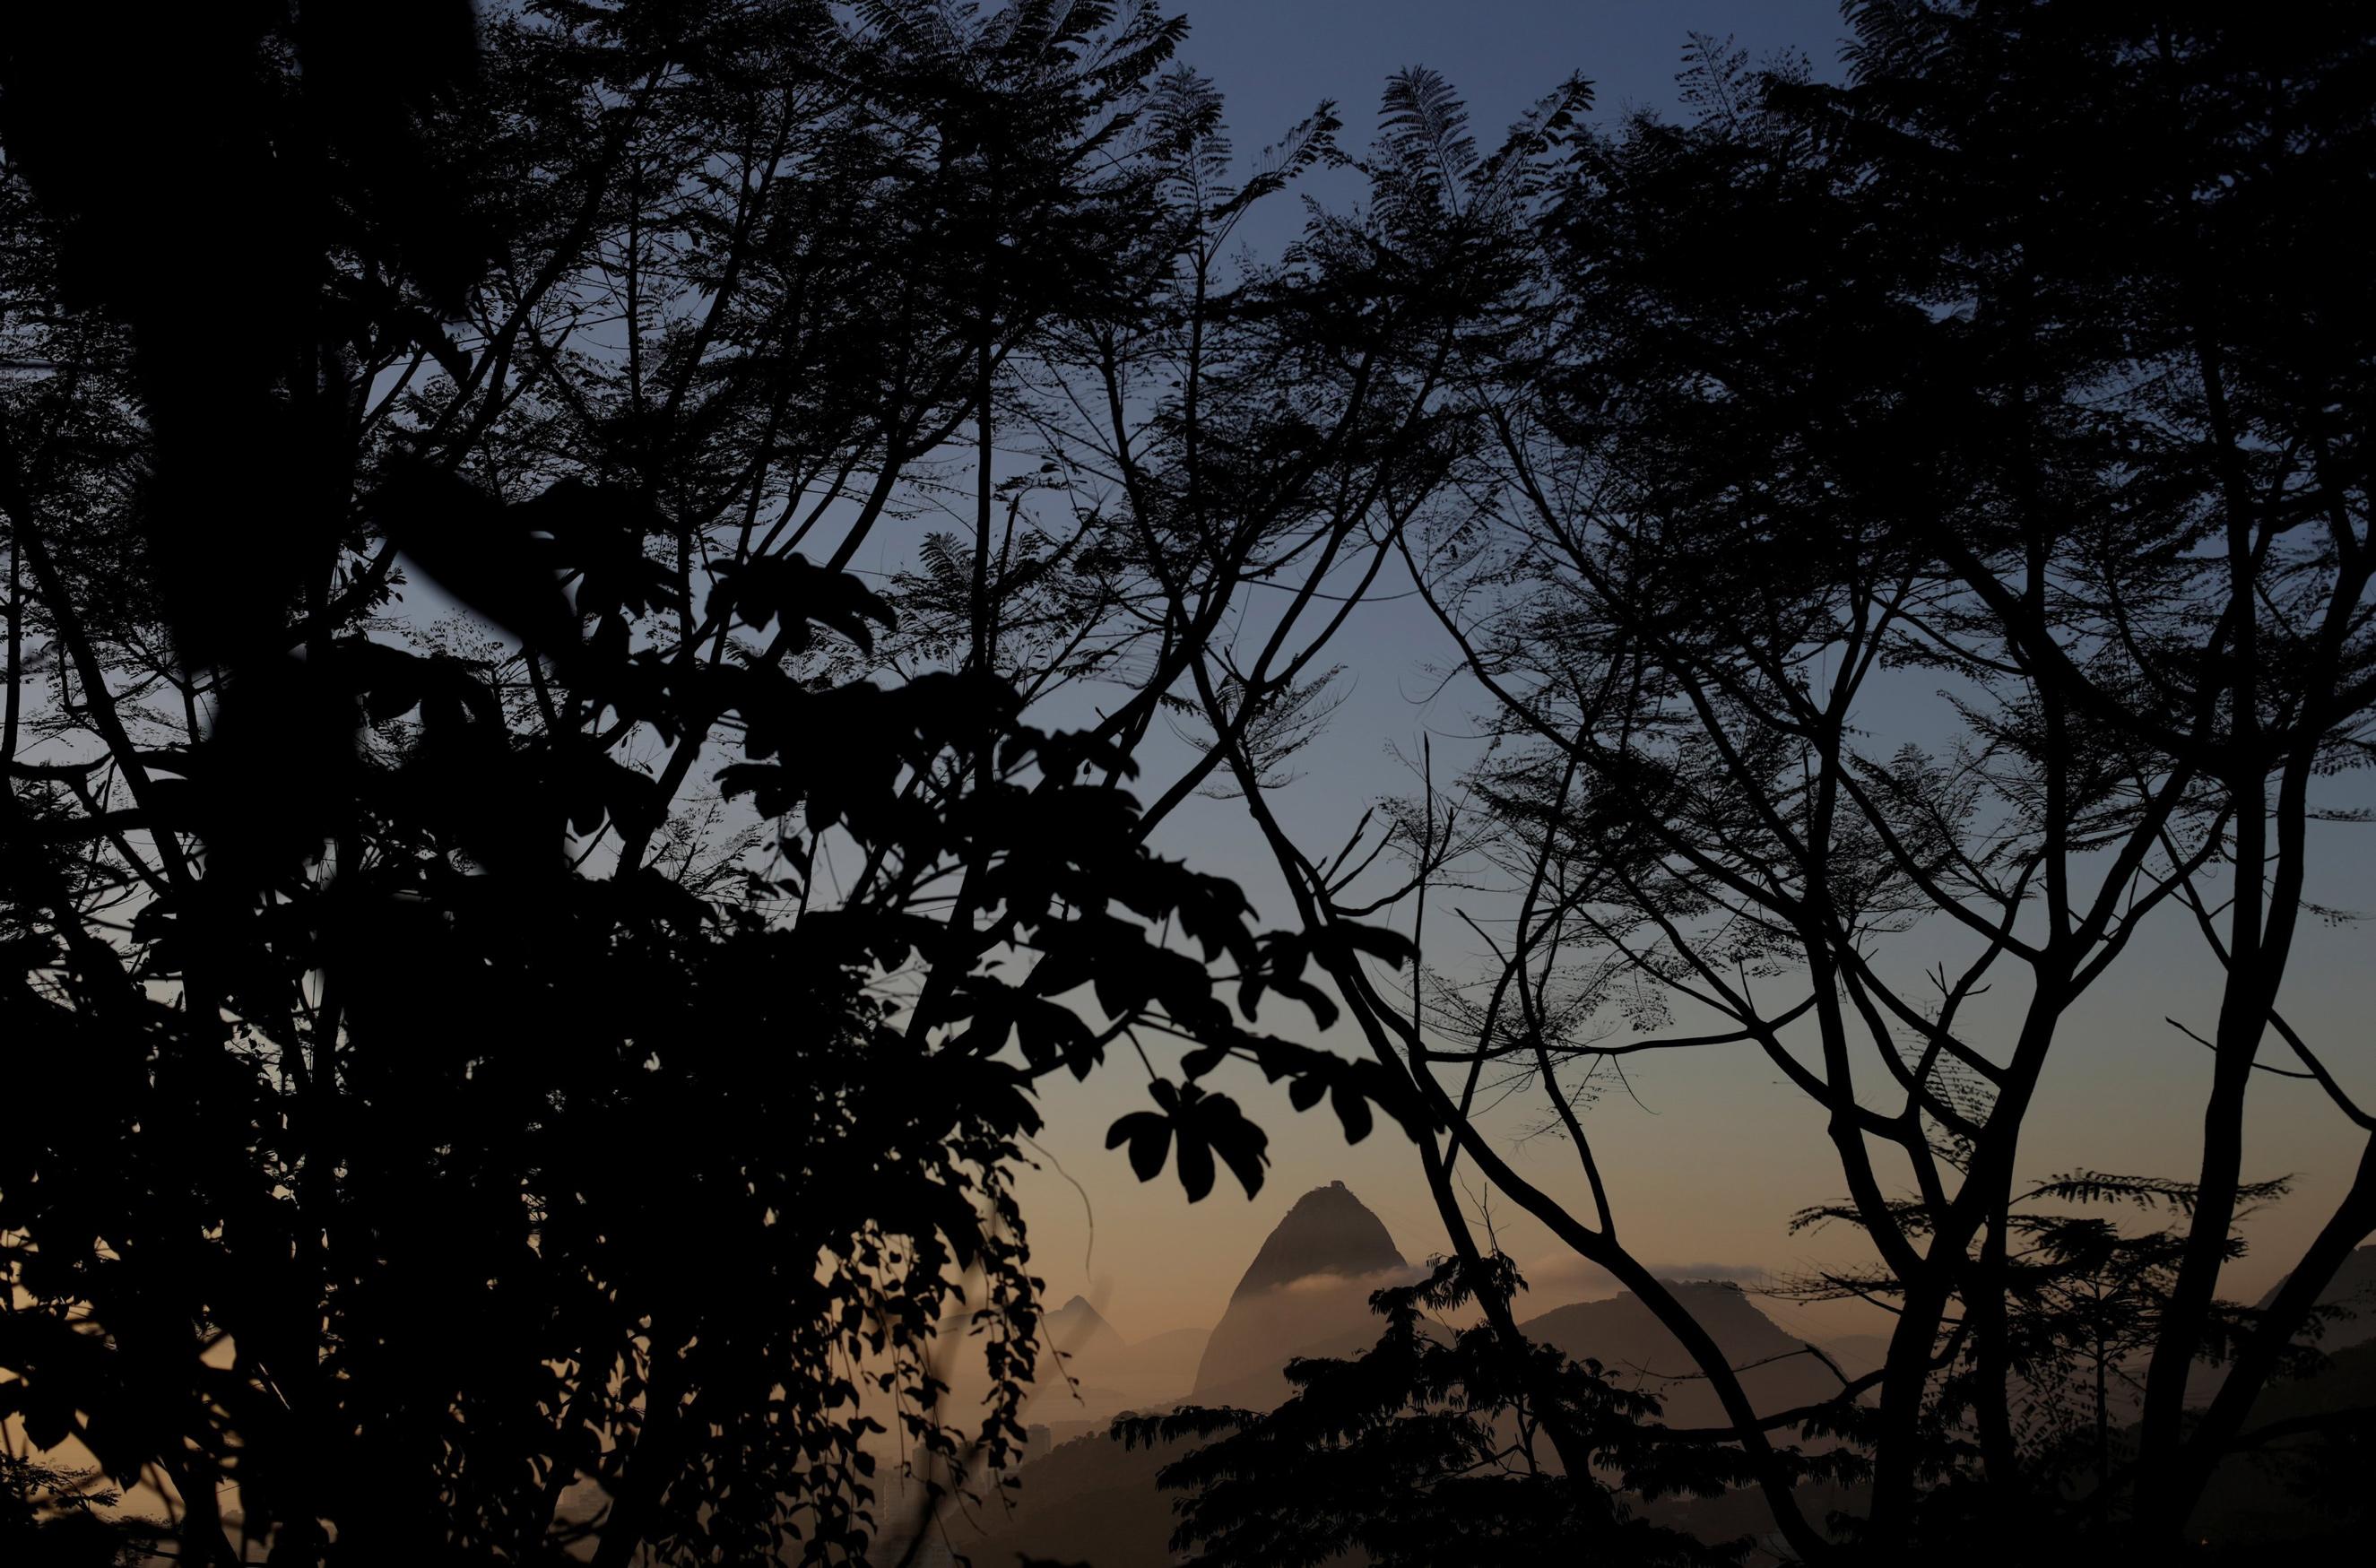 Sugarloaf Mountain is seen from the Santa Teresa neighbourhood during sunrise in Rio de Janeiro on June 16, 2016.